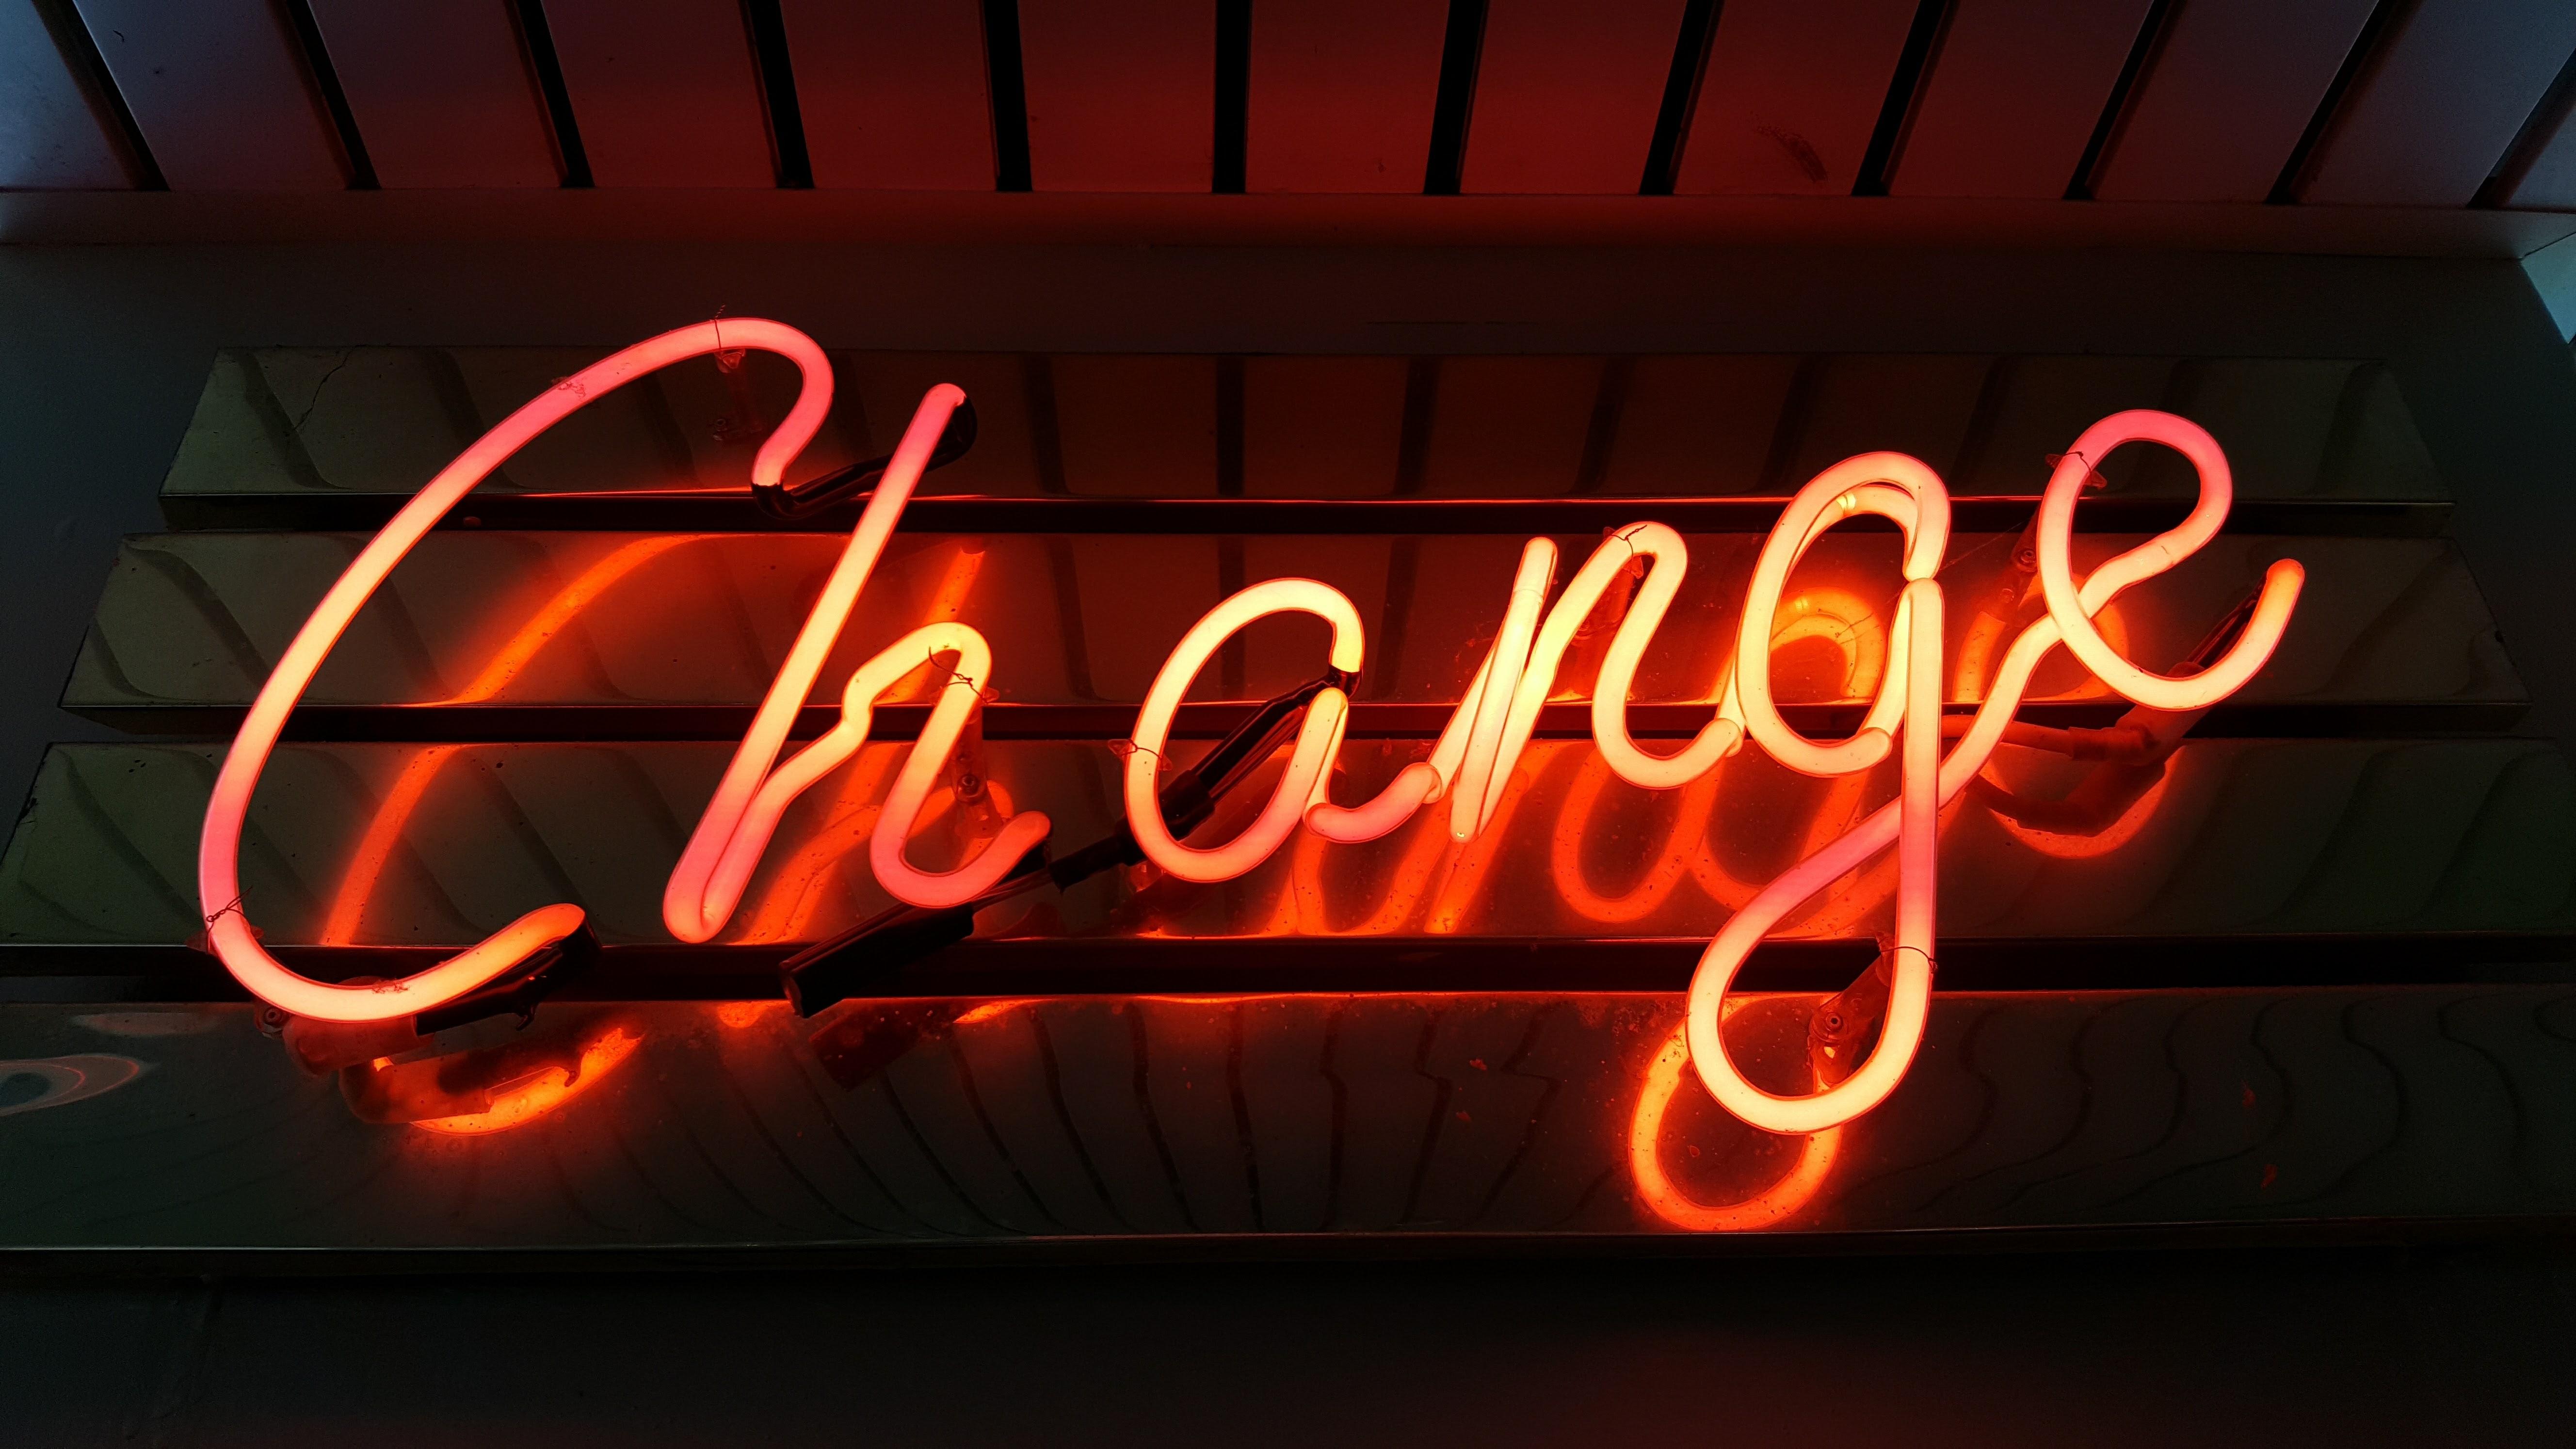 parallell advisors - change